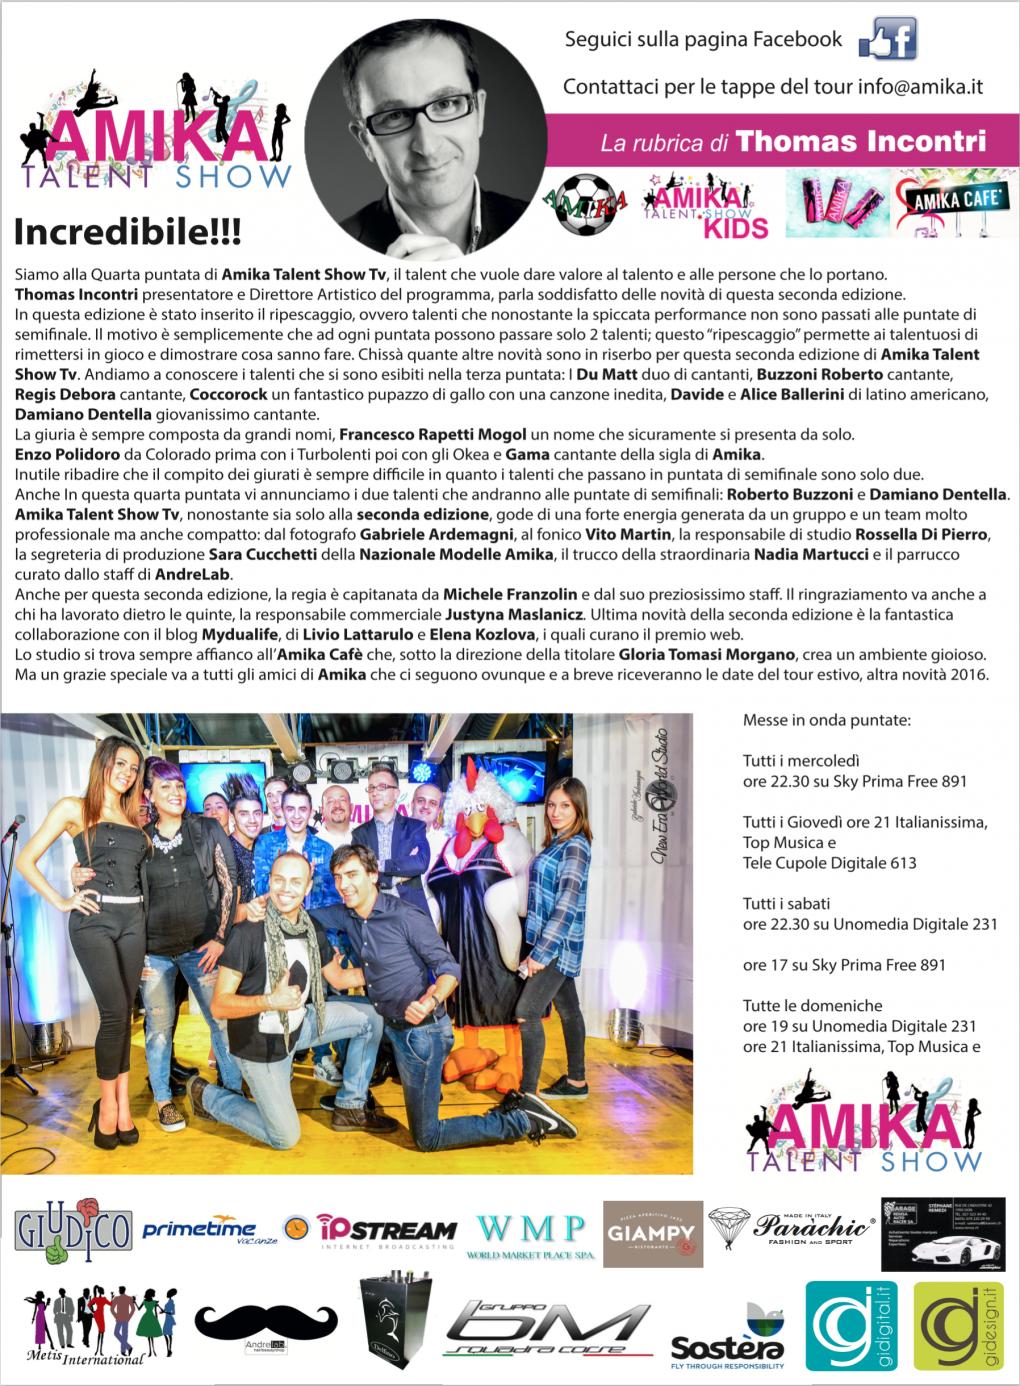 Vip 2016 Amika Talent Show 4 Foto by Gabriele Ardemagni